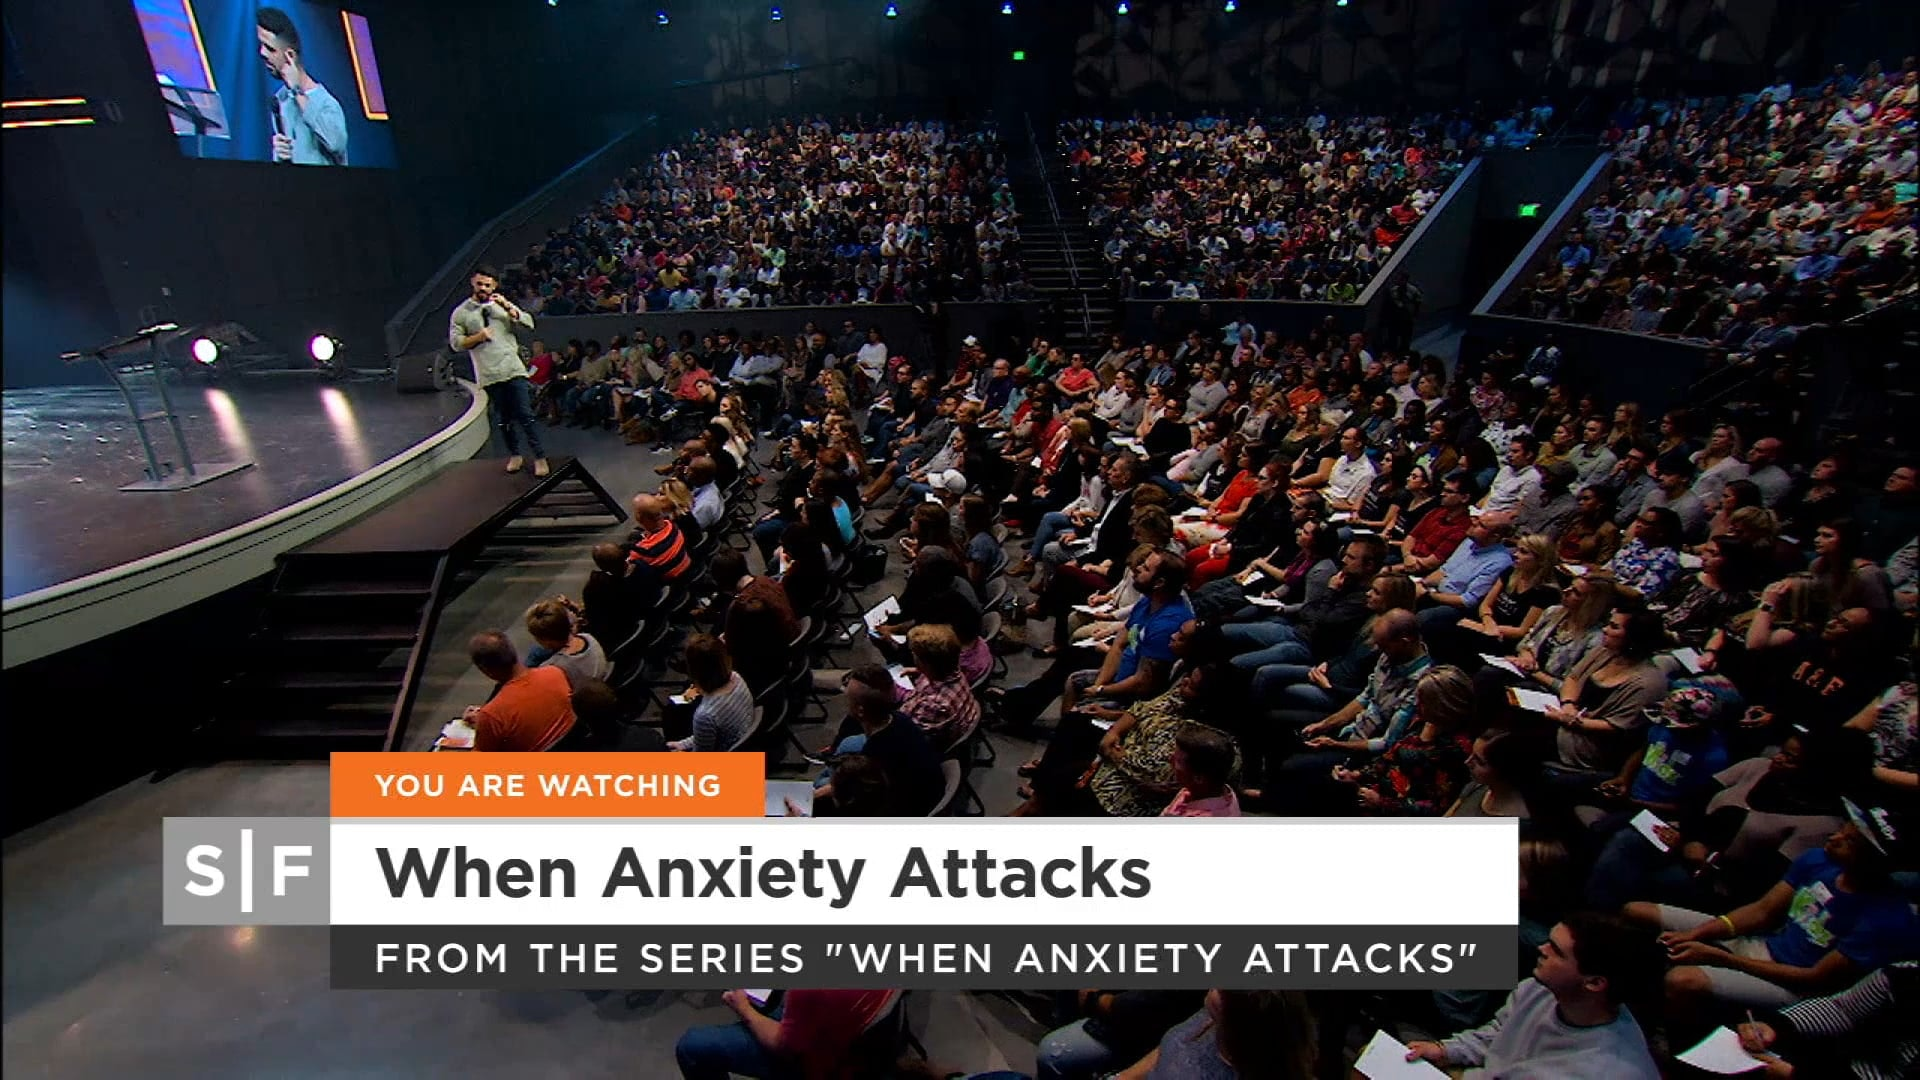 Watch When Anxiety Attacks Part 2